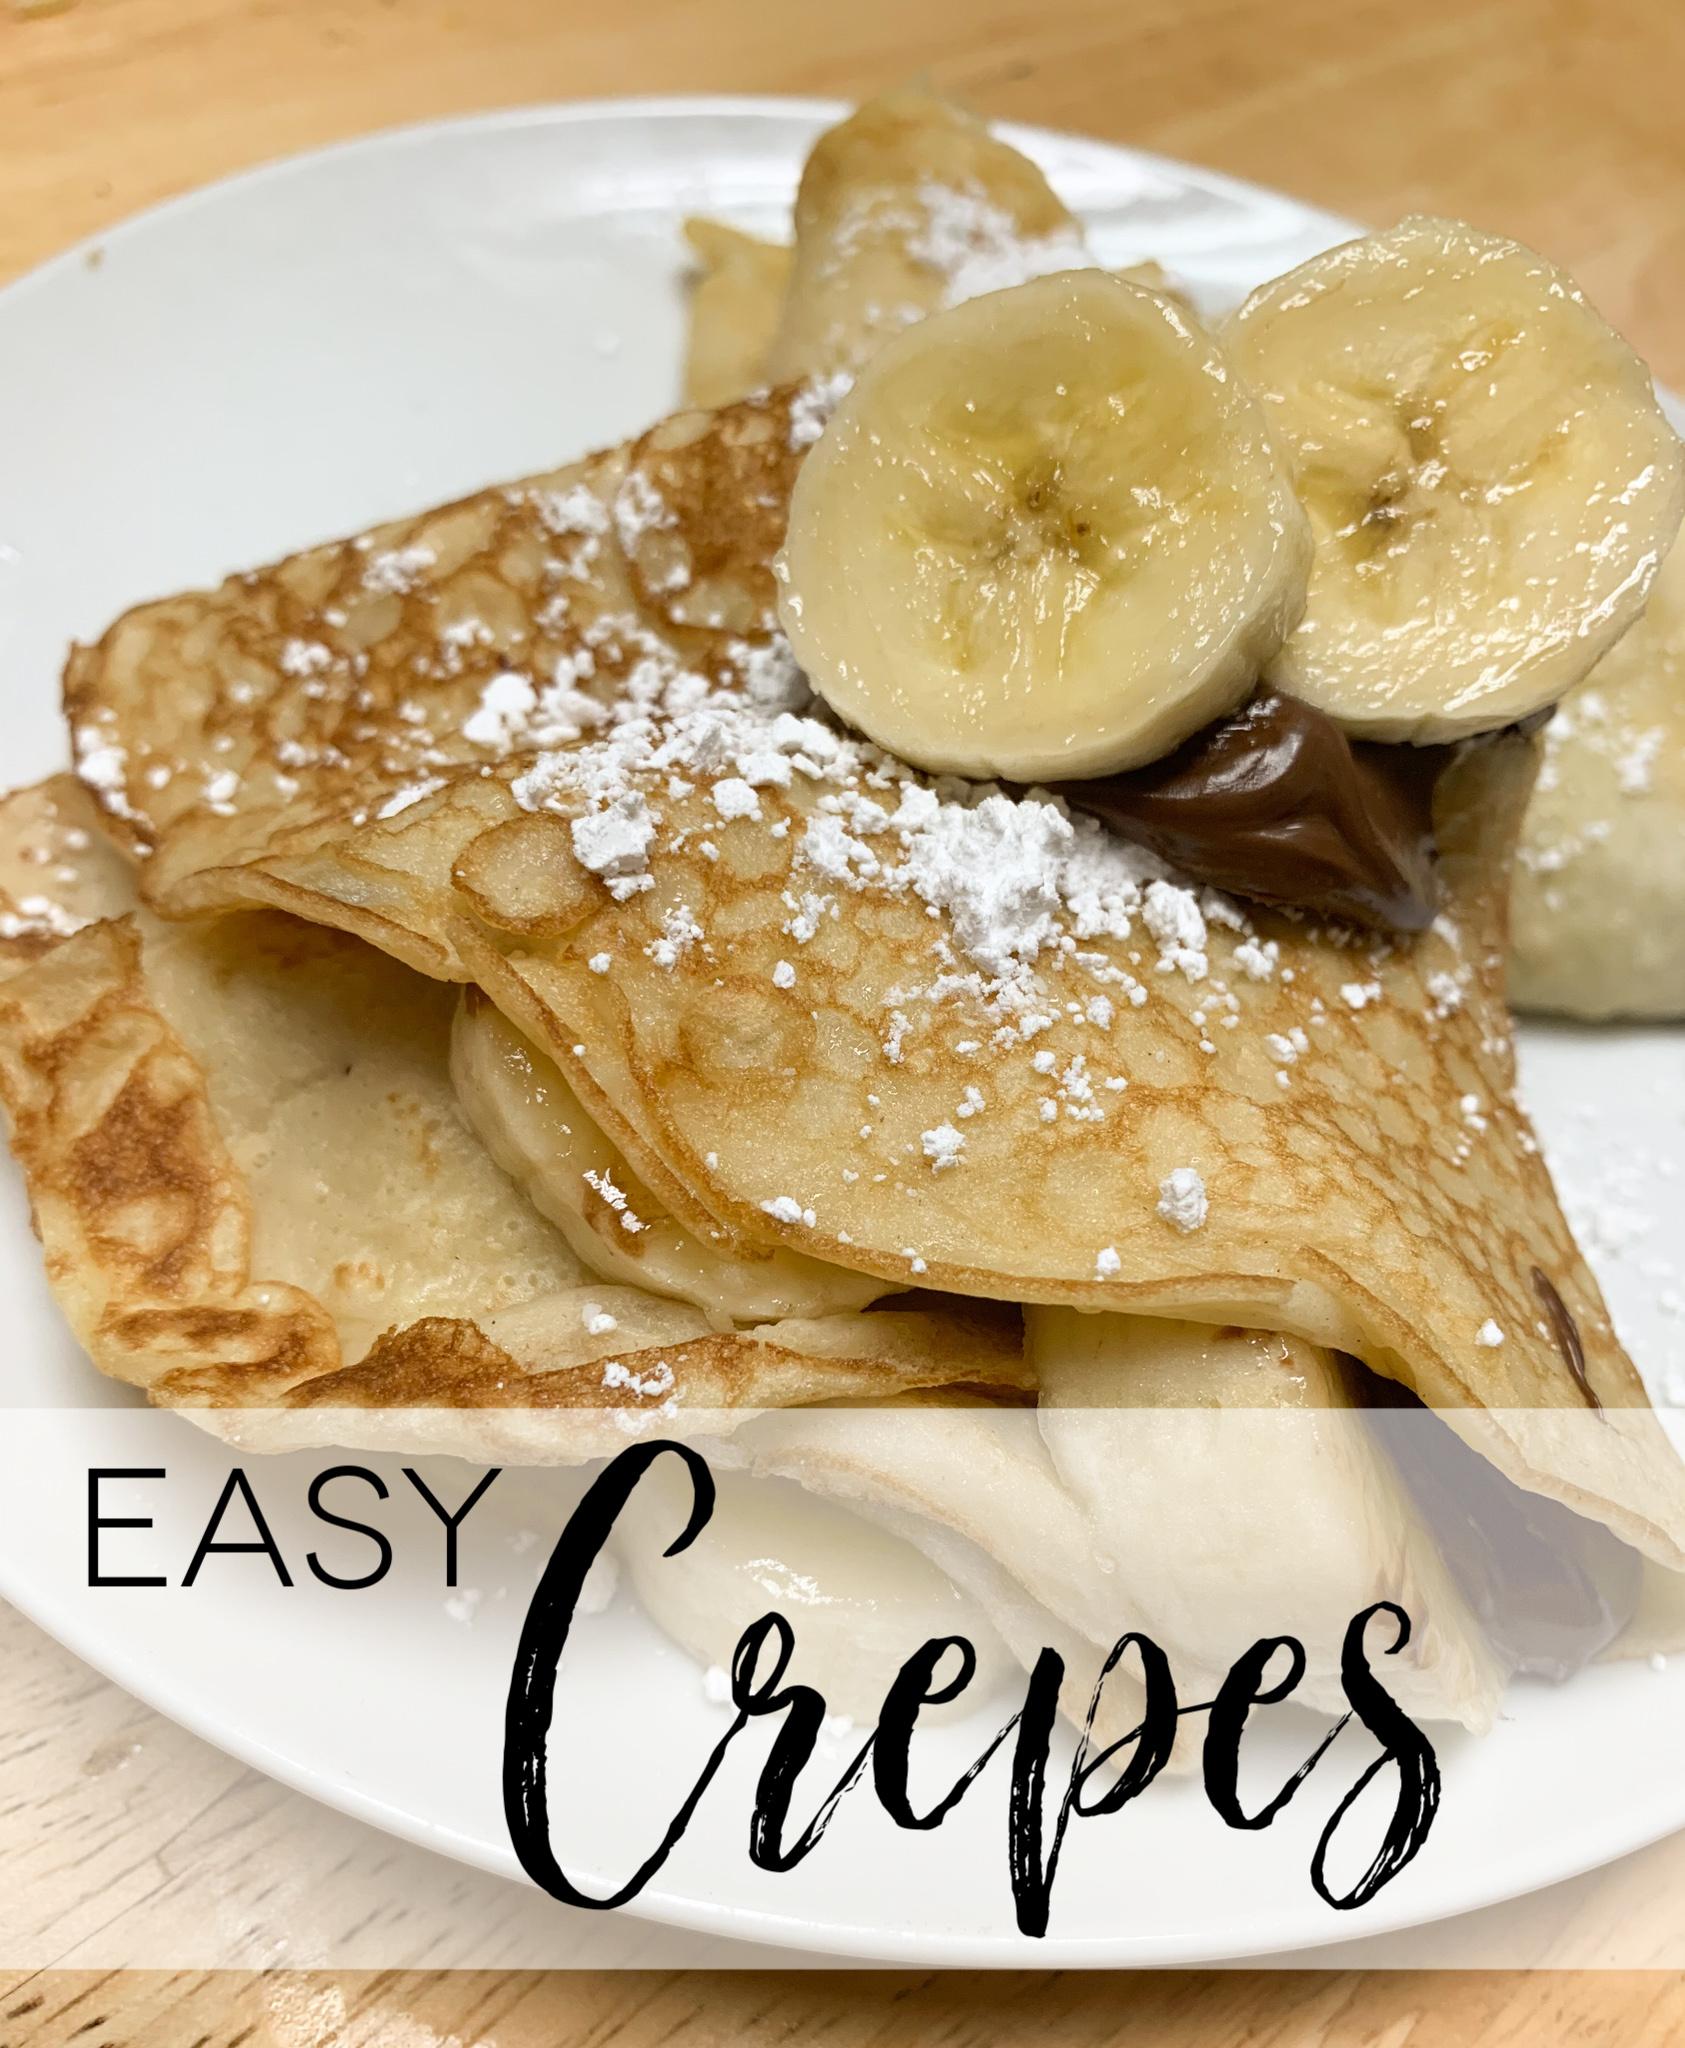 4 Ingredient Easy Crepes